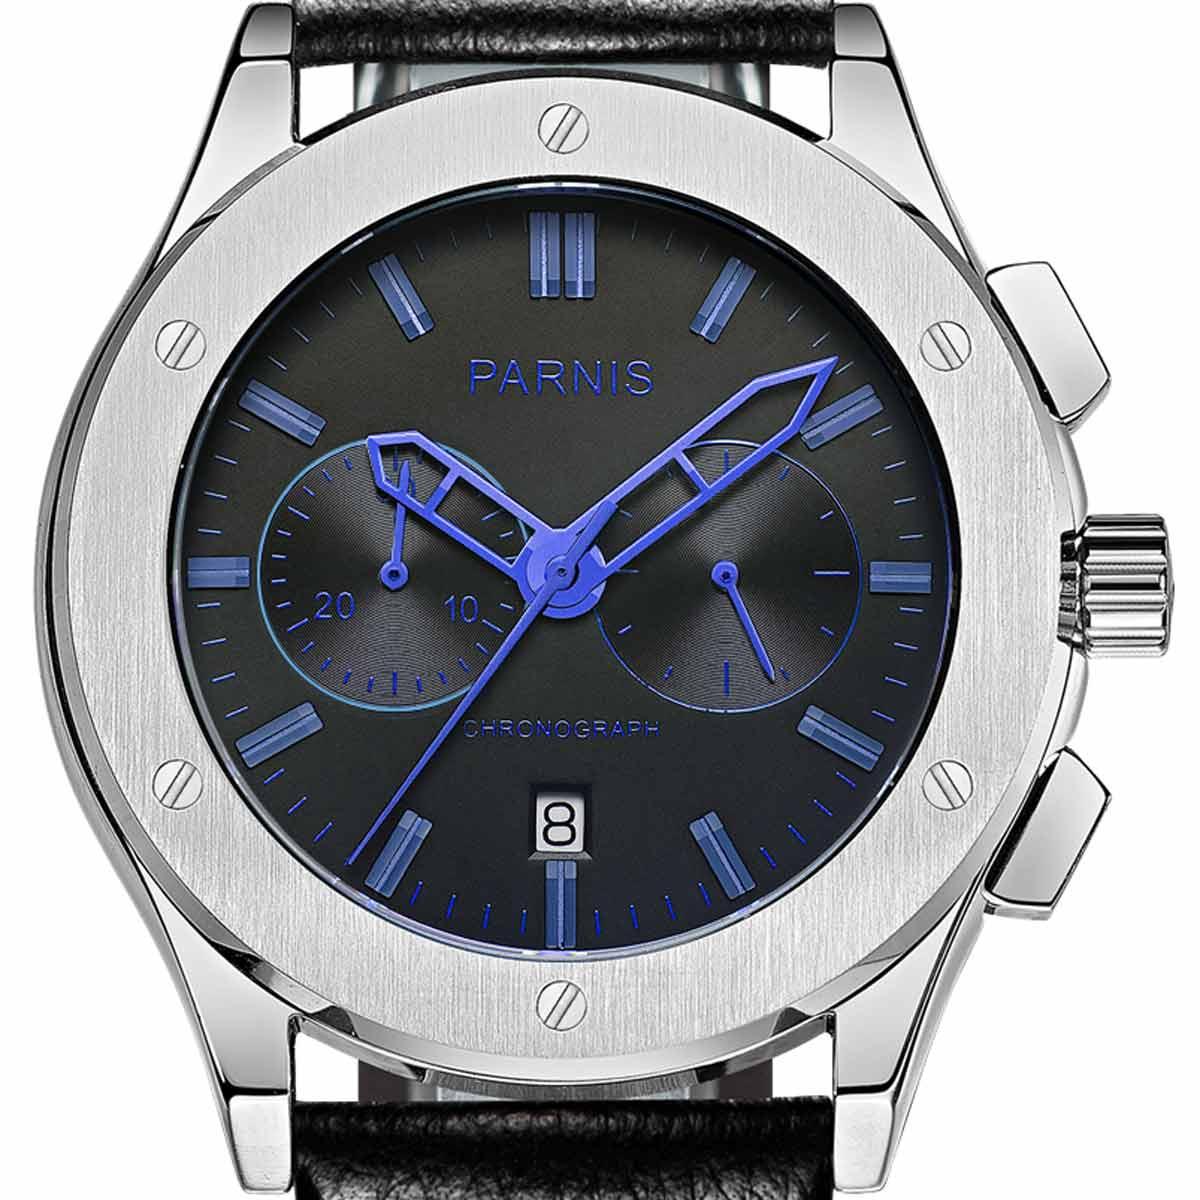 【NEW】PARNIS パーニス クォーツ 腕時計 [P6025-S5EL-BkblBK] 並行輸入品 純正ケース メーカー保証12ヶ月